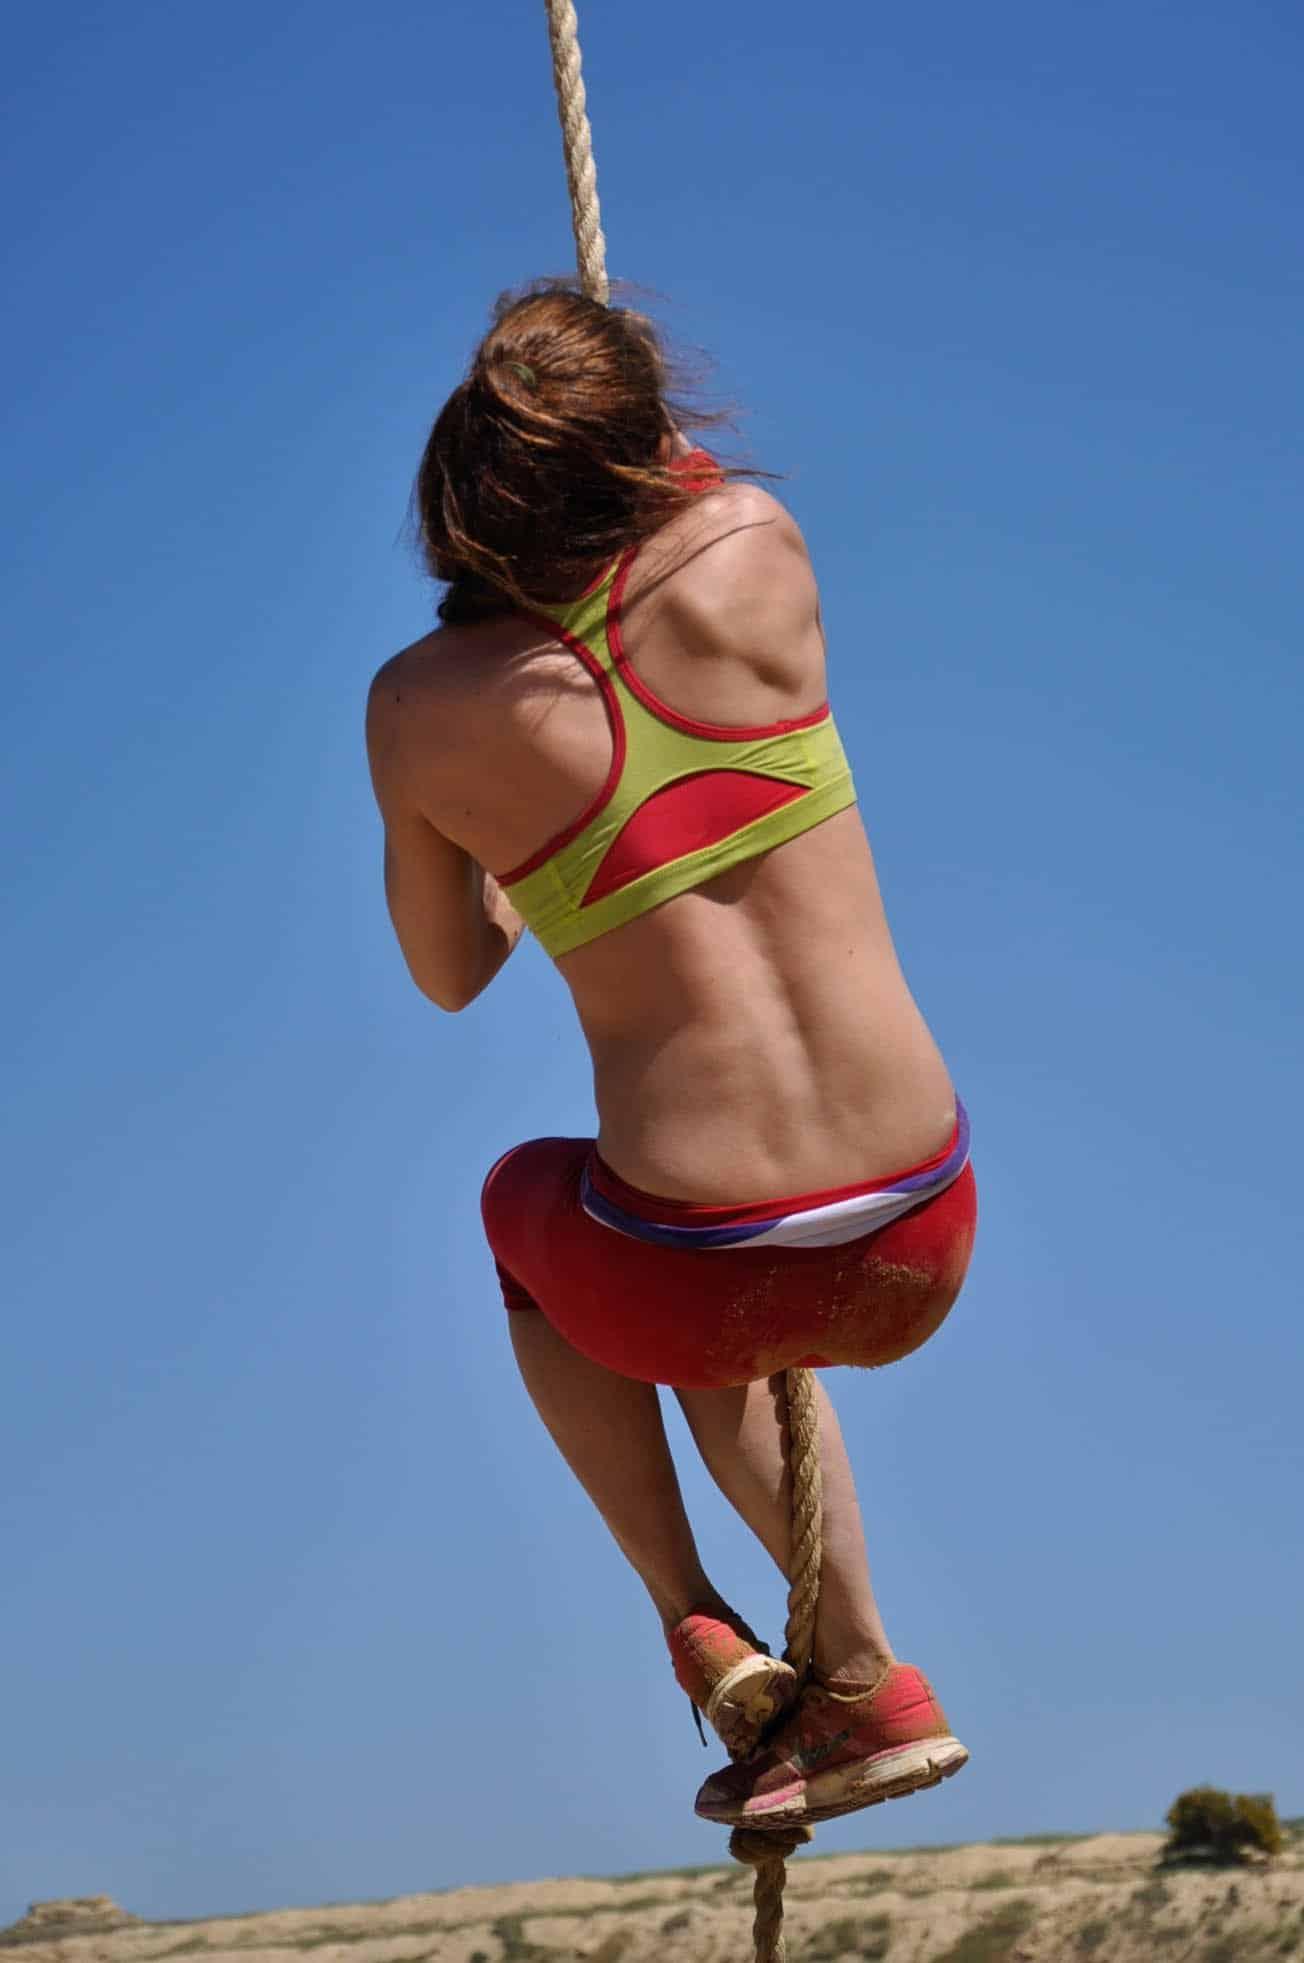 gym-climbing-rope